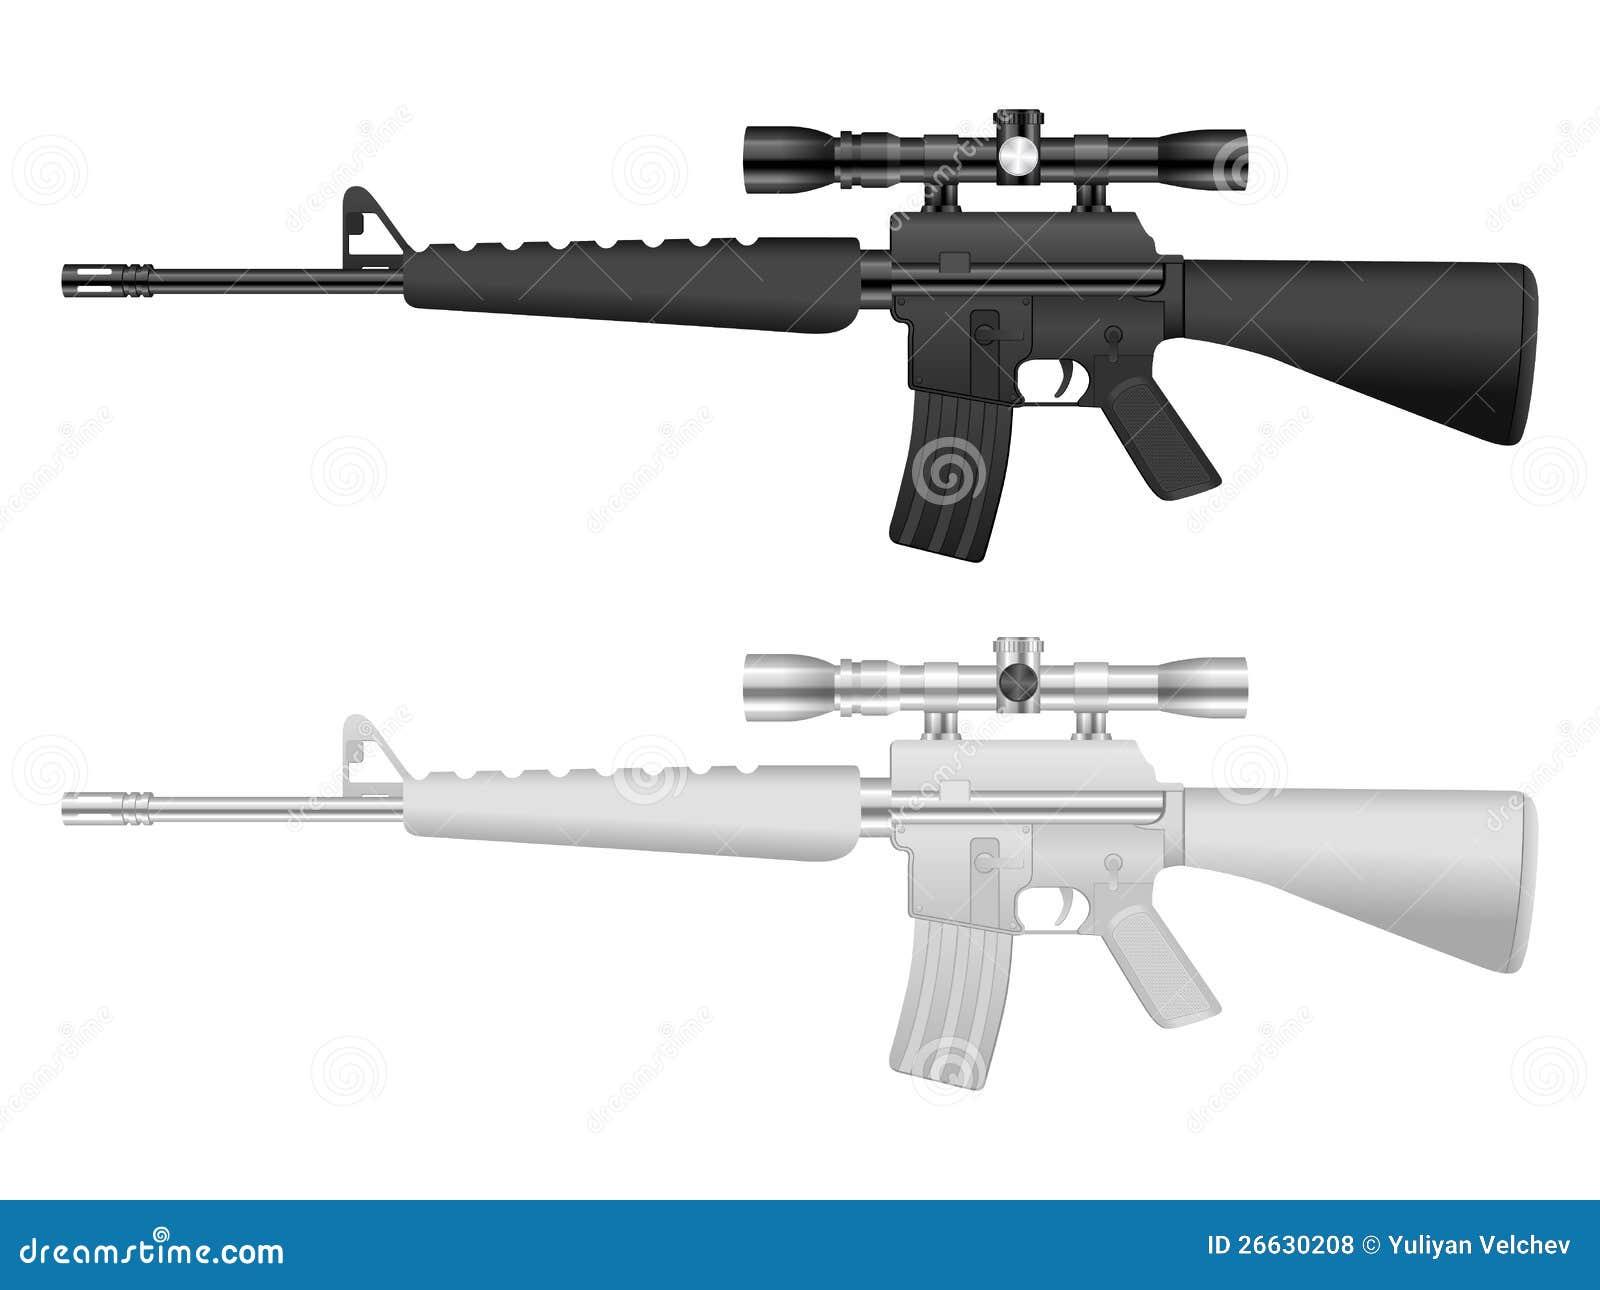 M16 Sniper Set Royalty Free Stock Photos - Image: 26630208 M16